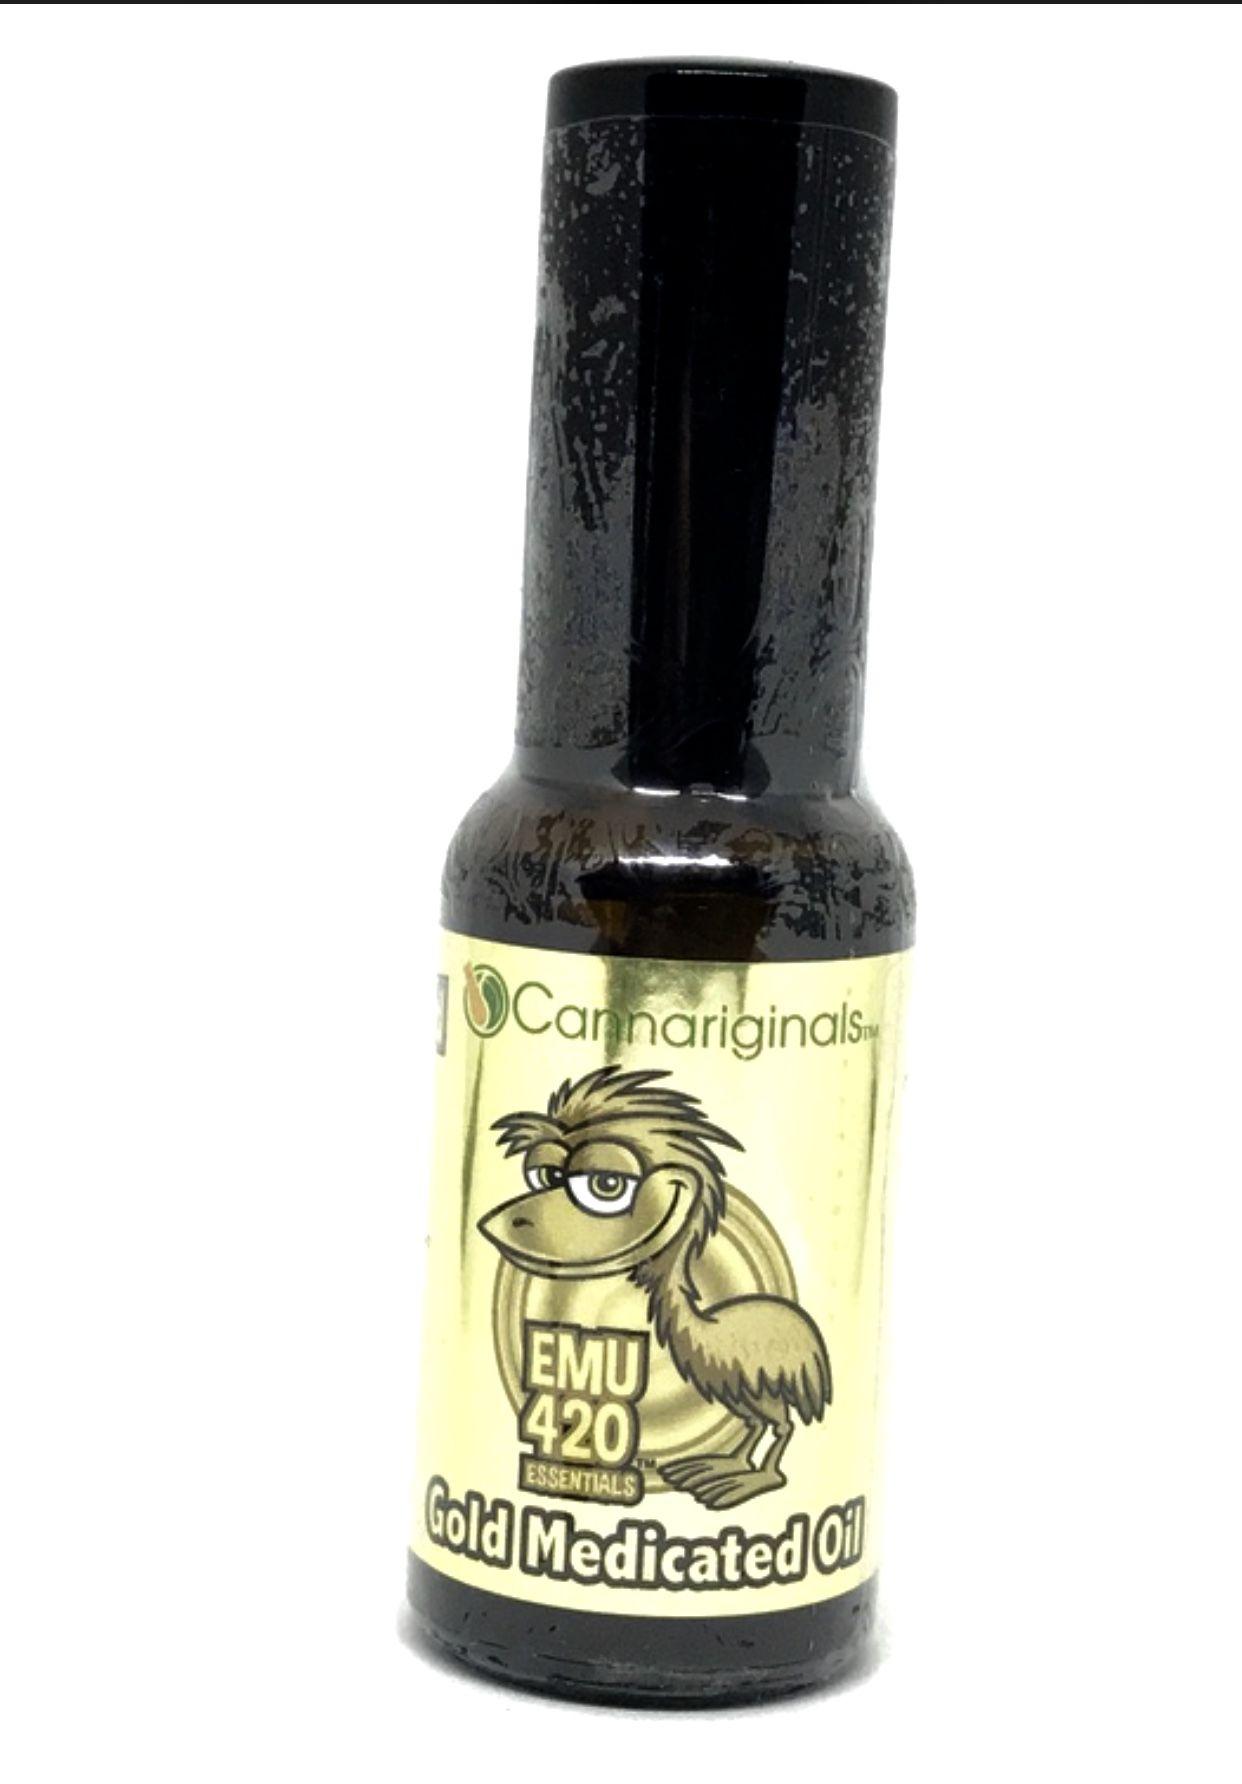 Emu 420 Gold Medicated Oil, 50mg